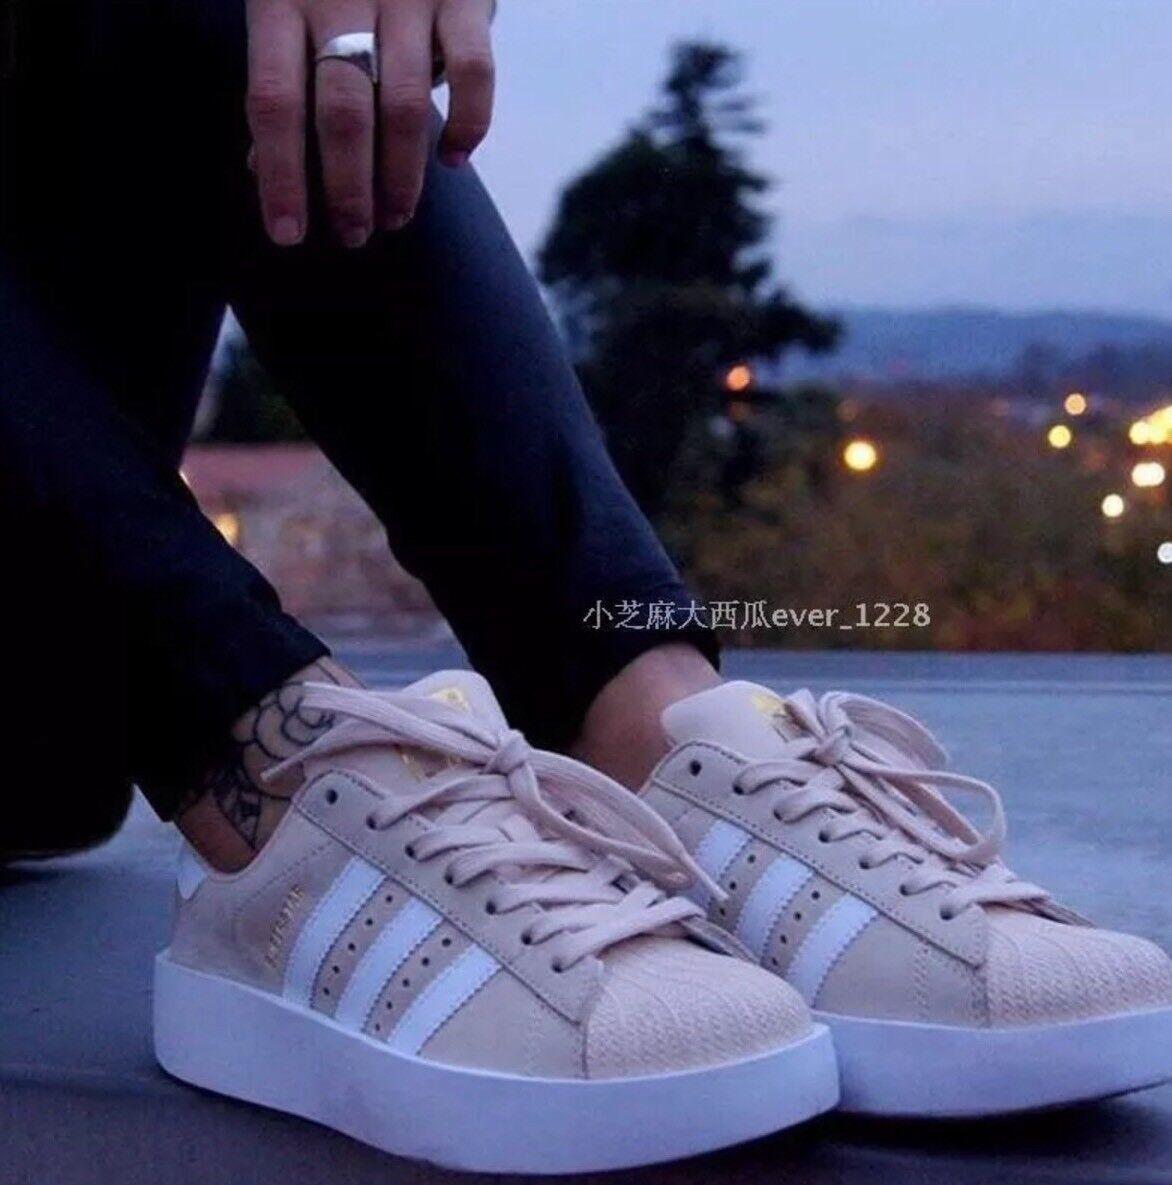 adidas Original Superstar Bold CG2886 Women's Sneakers Shoes